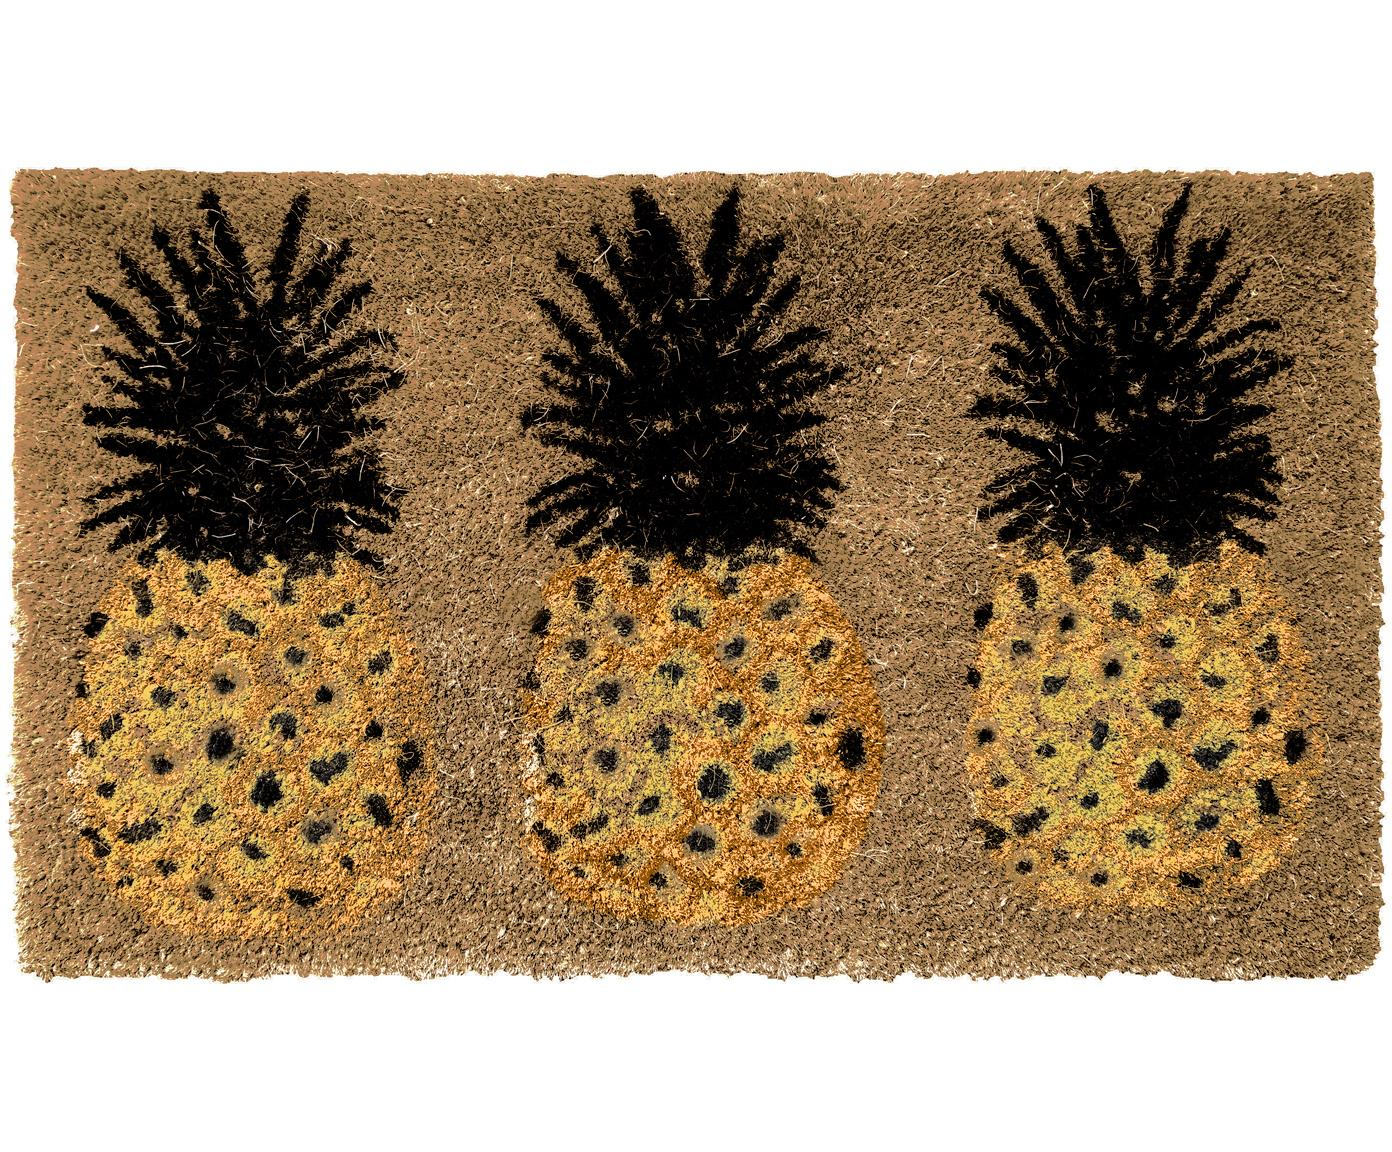 Zerbino antiscivolo in cocco con ananas Pineapples, Retro: PVC, Beige, giallo, nero, Larg. 45 x Lung. 75 cm